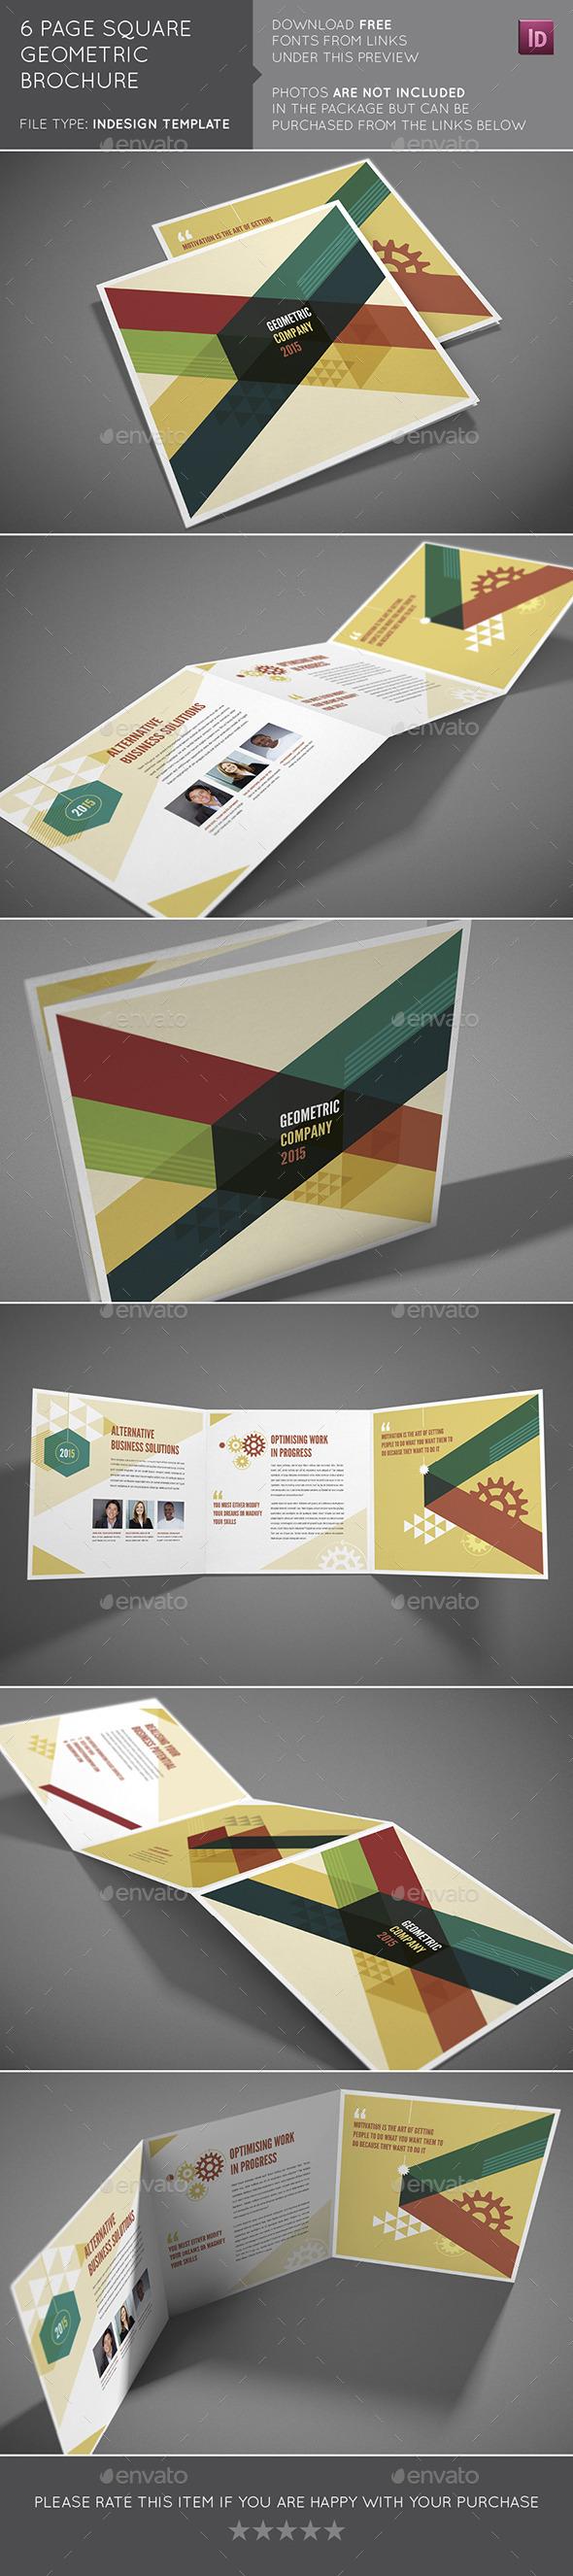 6 Page Square Geometric Brochure - Brochures Print Templates